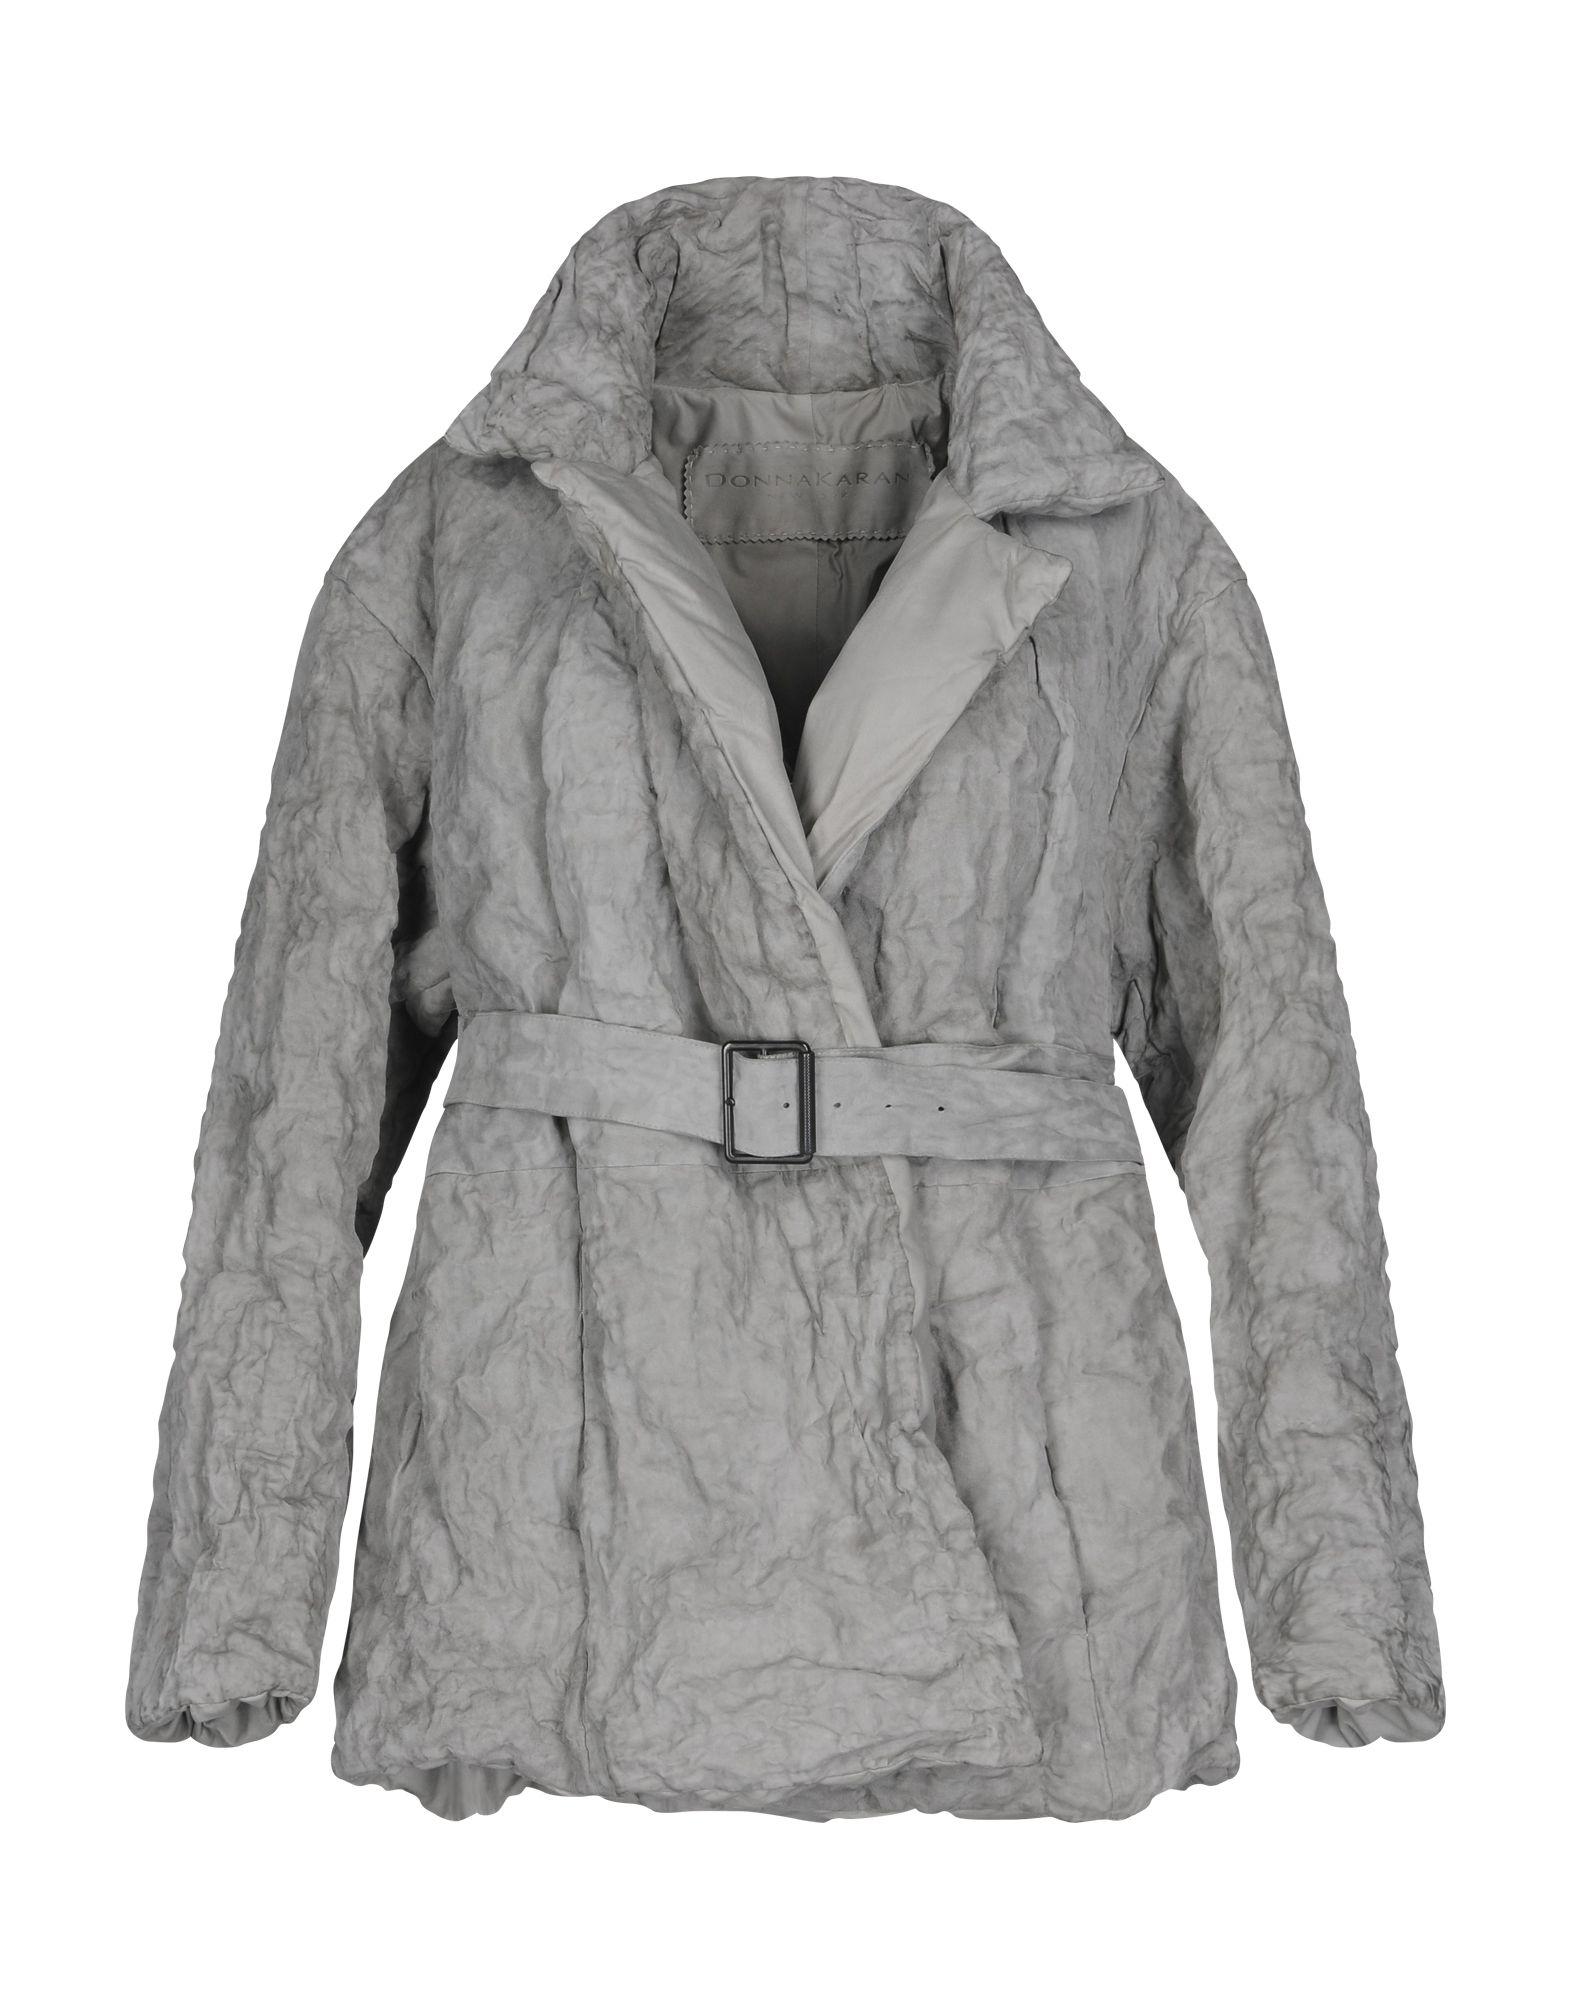 213d256f4d9 Donna Karan Leather Jacket - Women Donna Karan Leather Jackets online on  YOOX Canada - 41774657QL